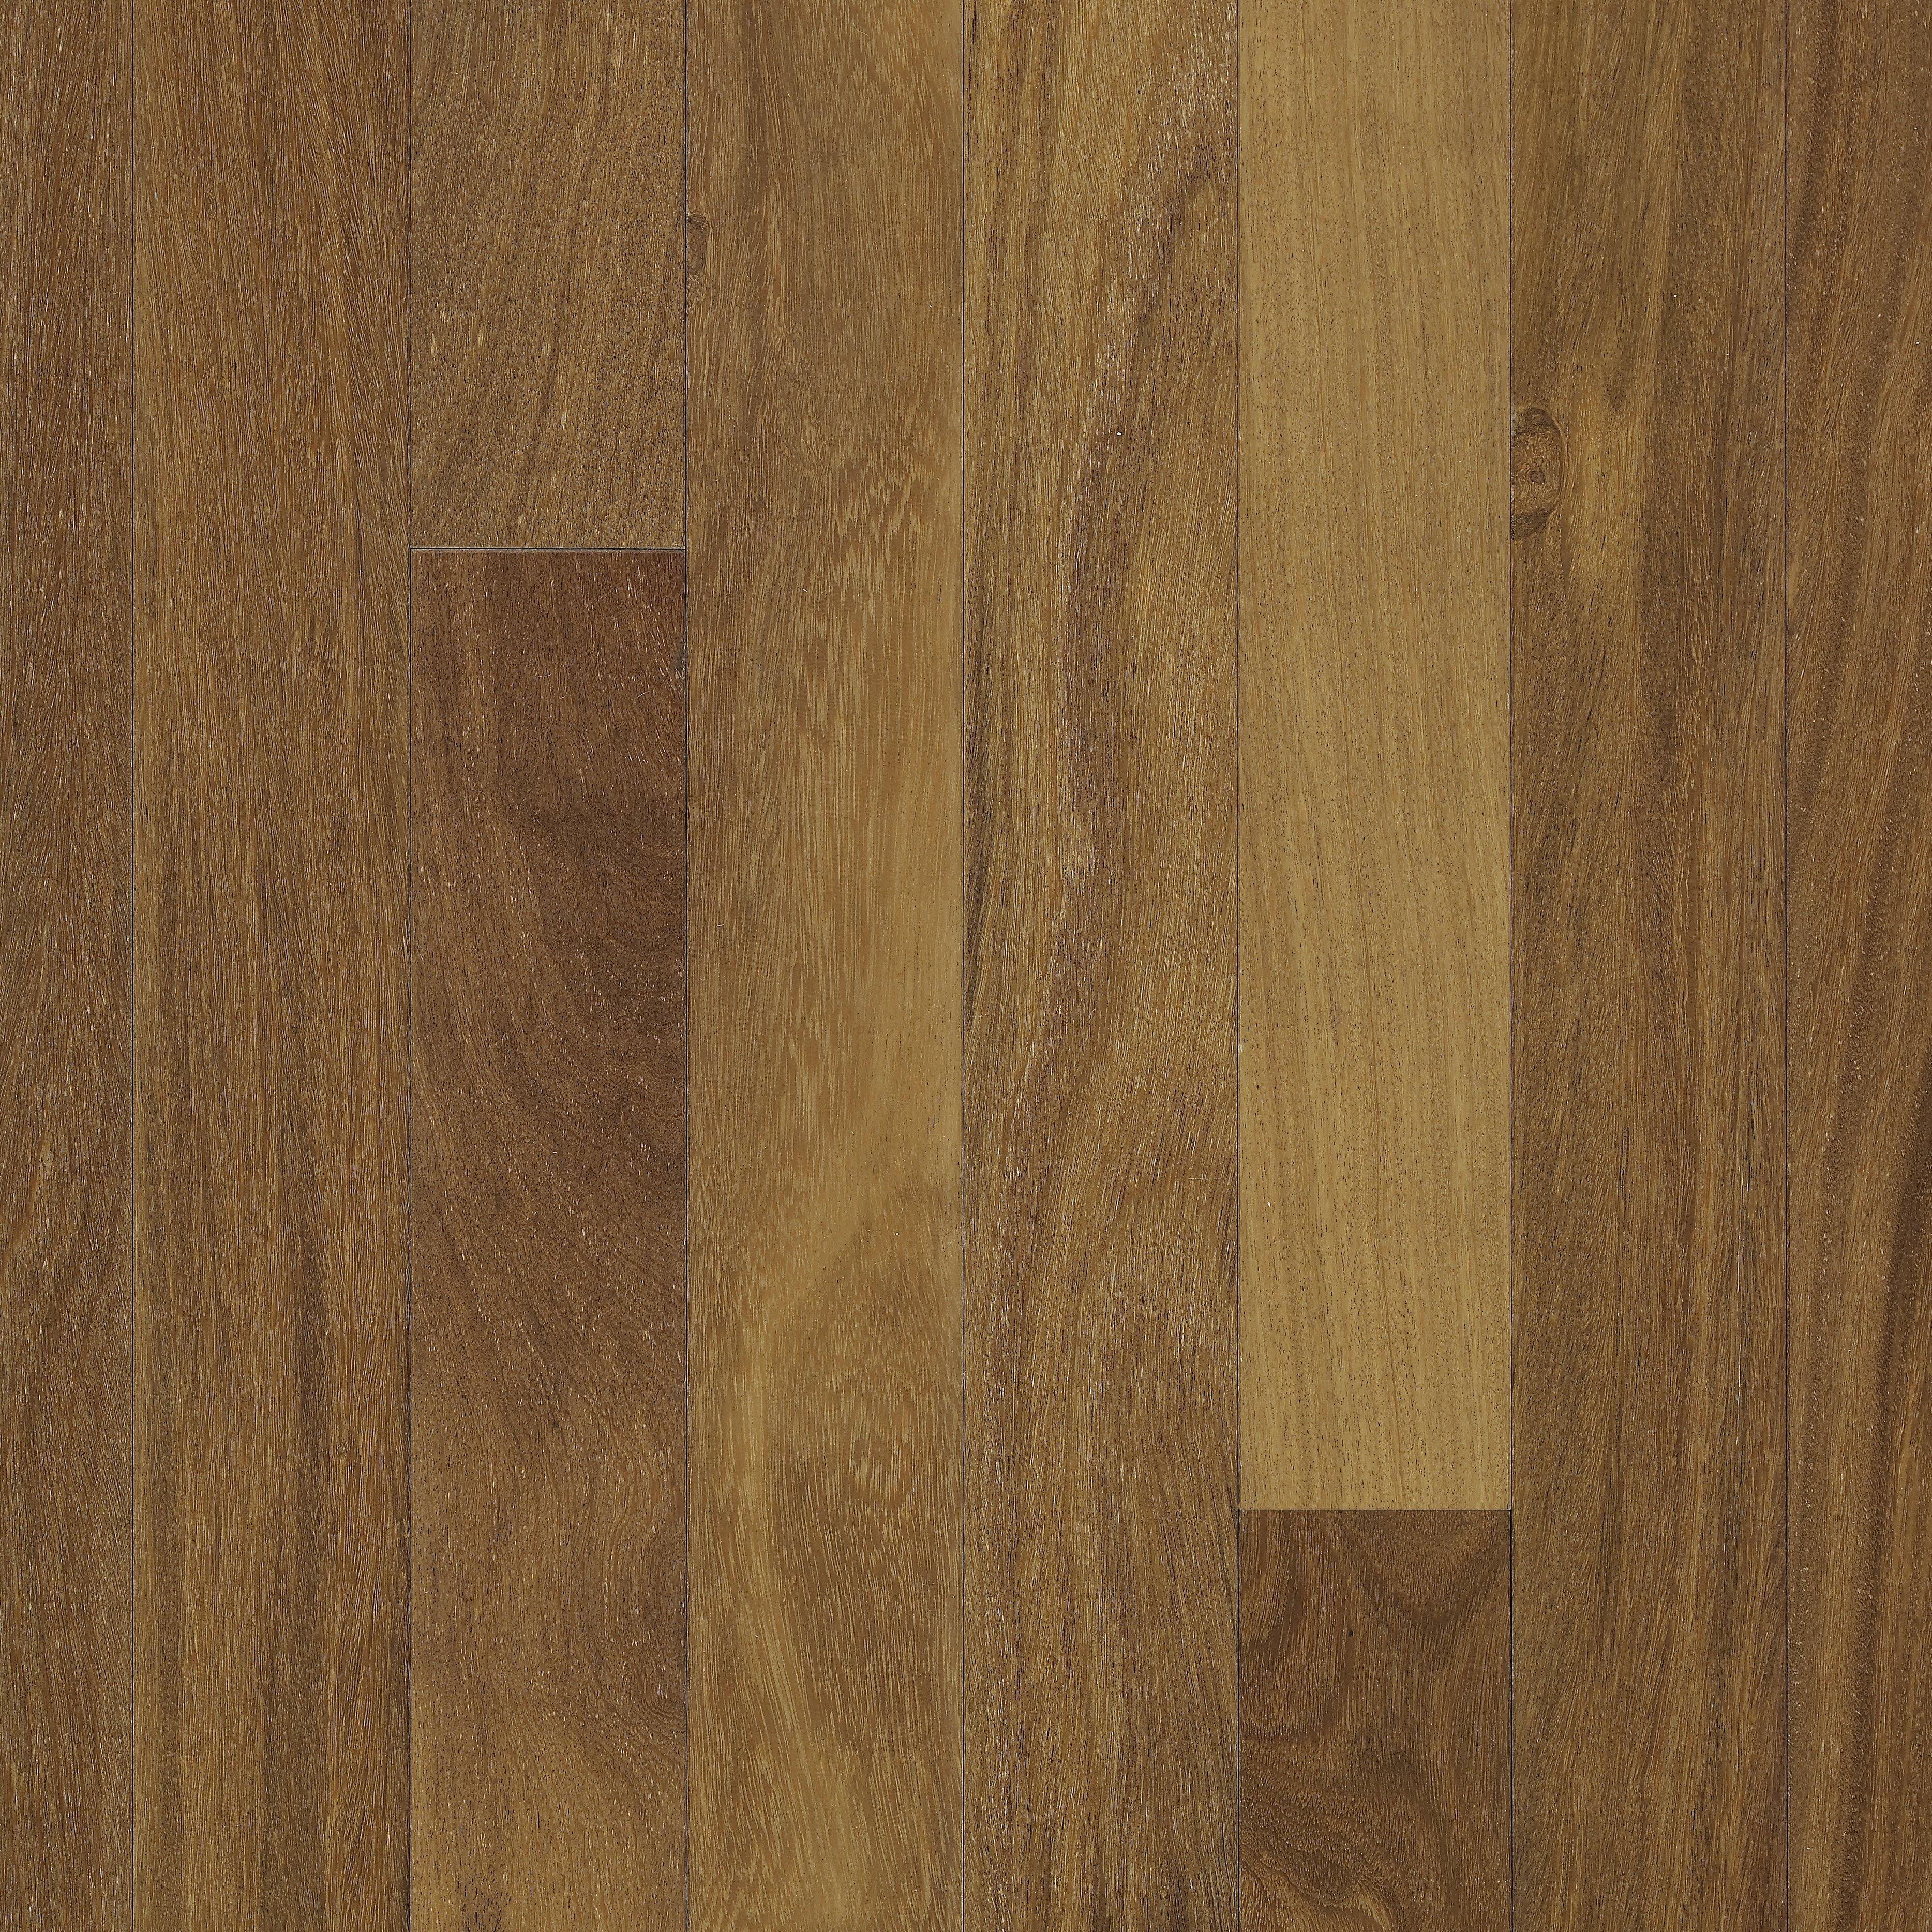 Albero valley 3 1 4 solid cumaru hardwood flooring in for Teak hardwood flooring